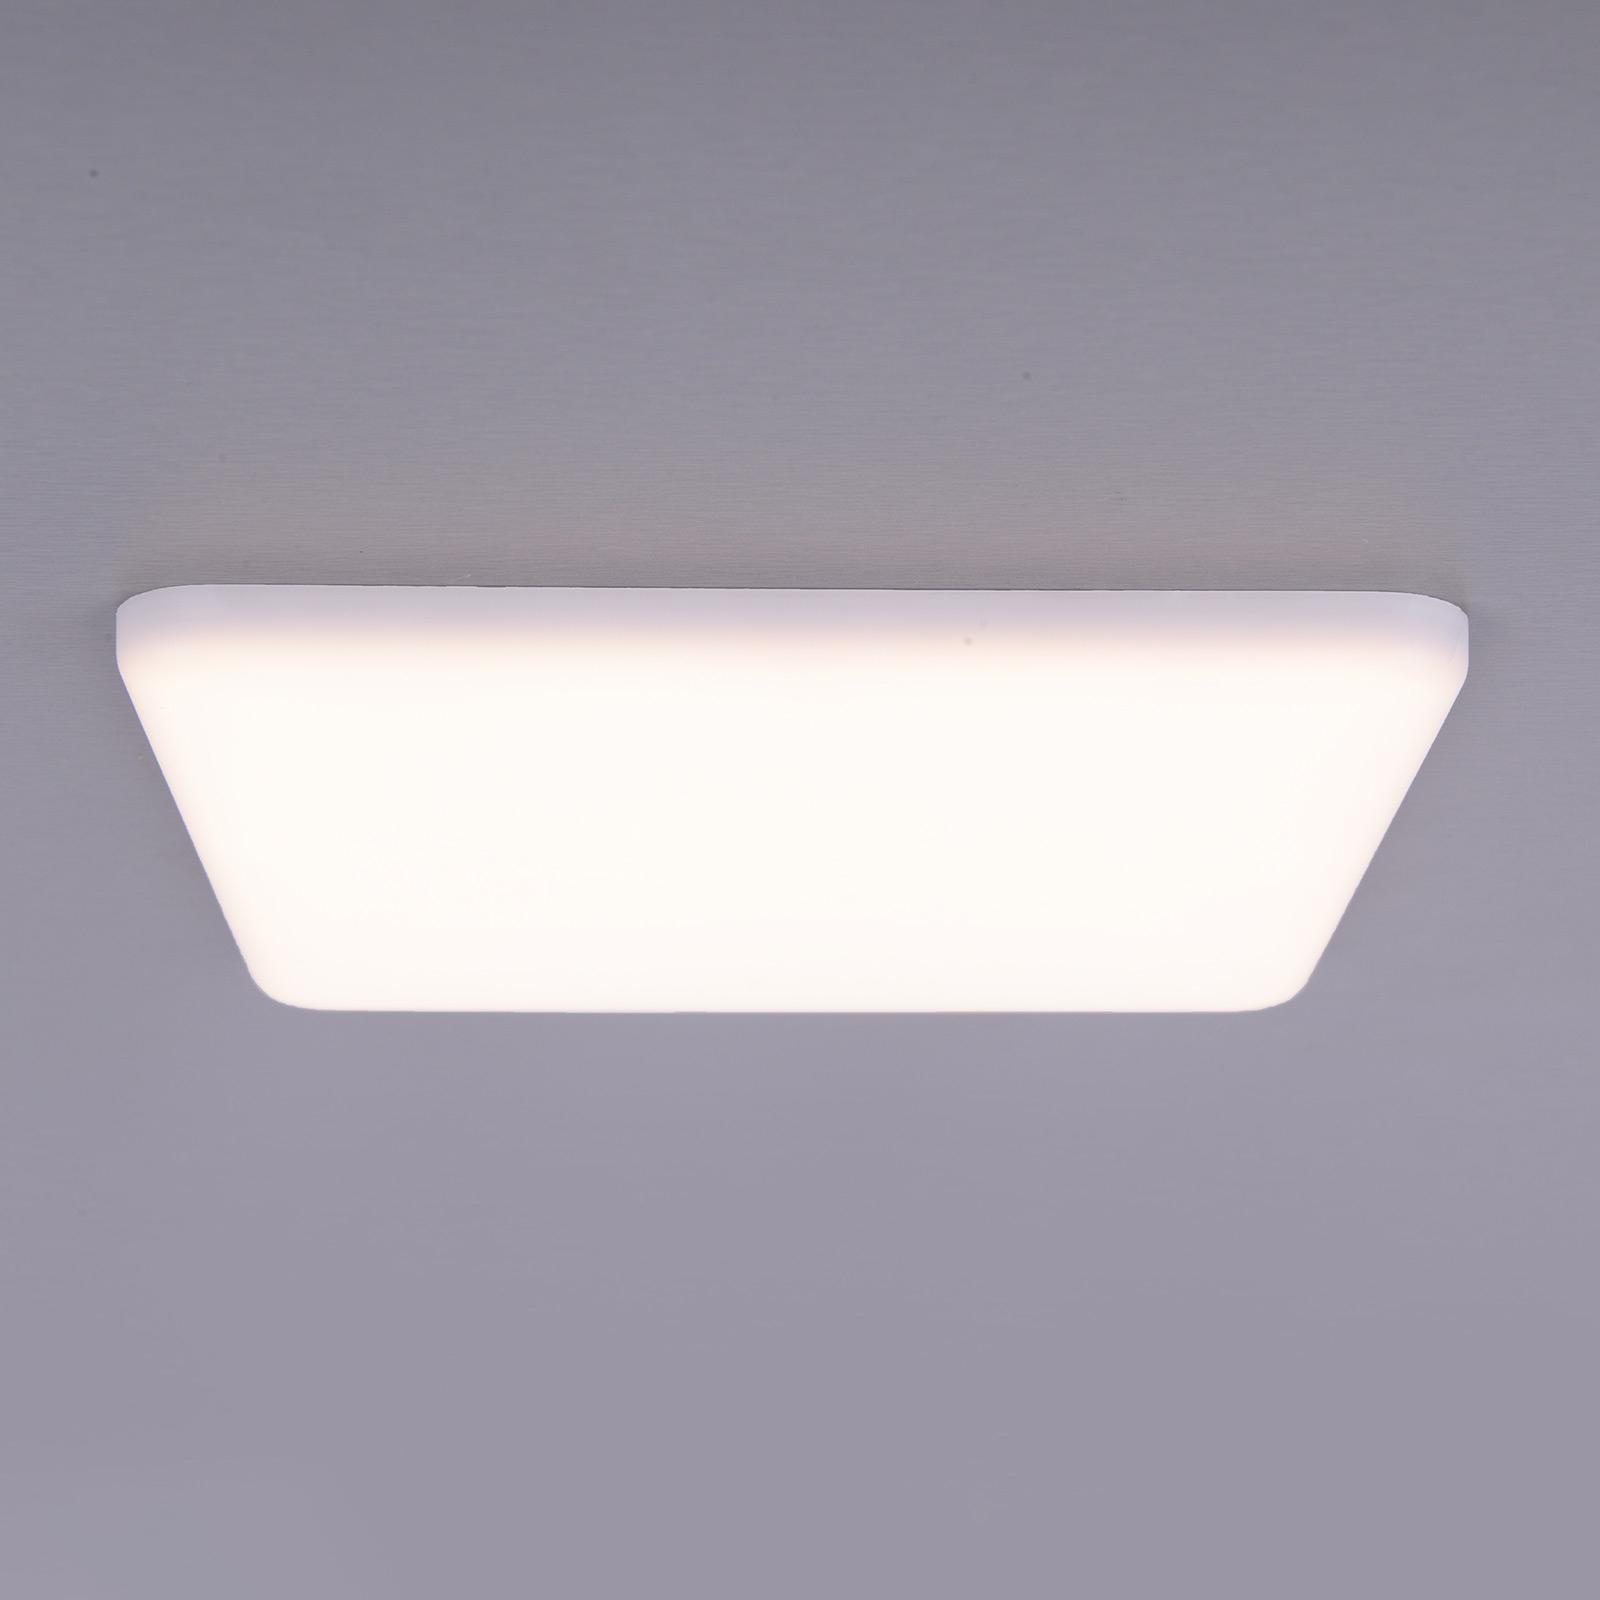 LED-uppovalaisin Sula, neliö, IP66, 21,5 cm